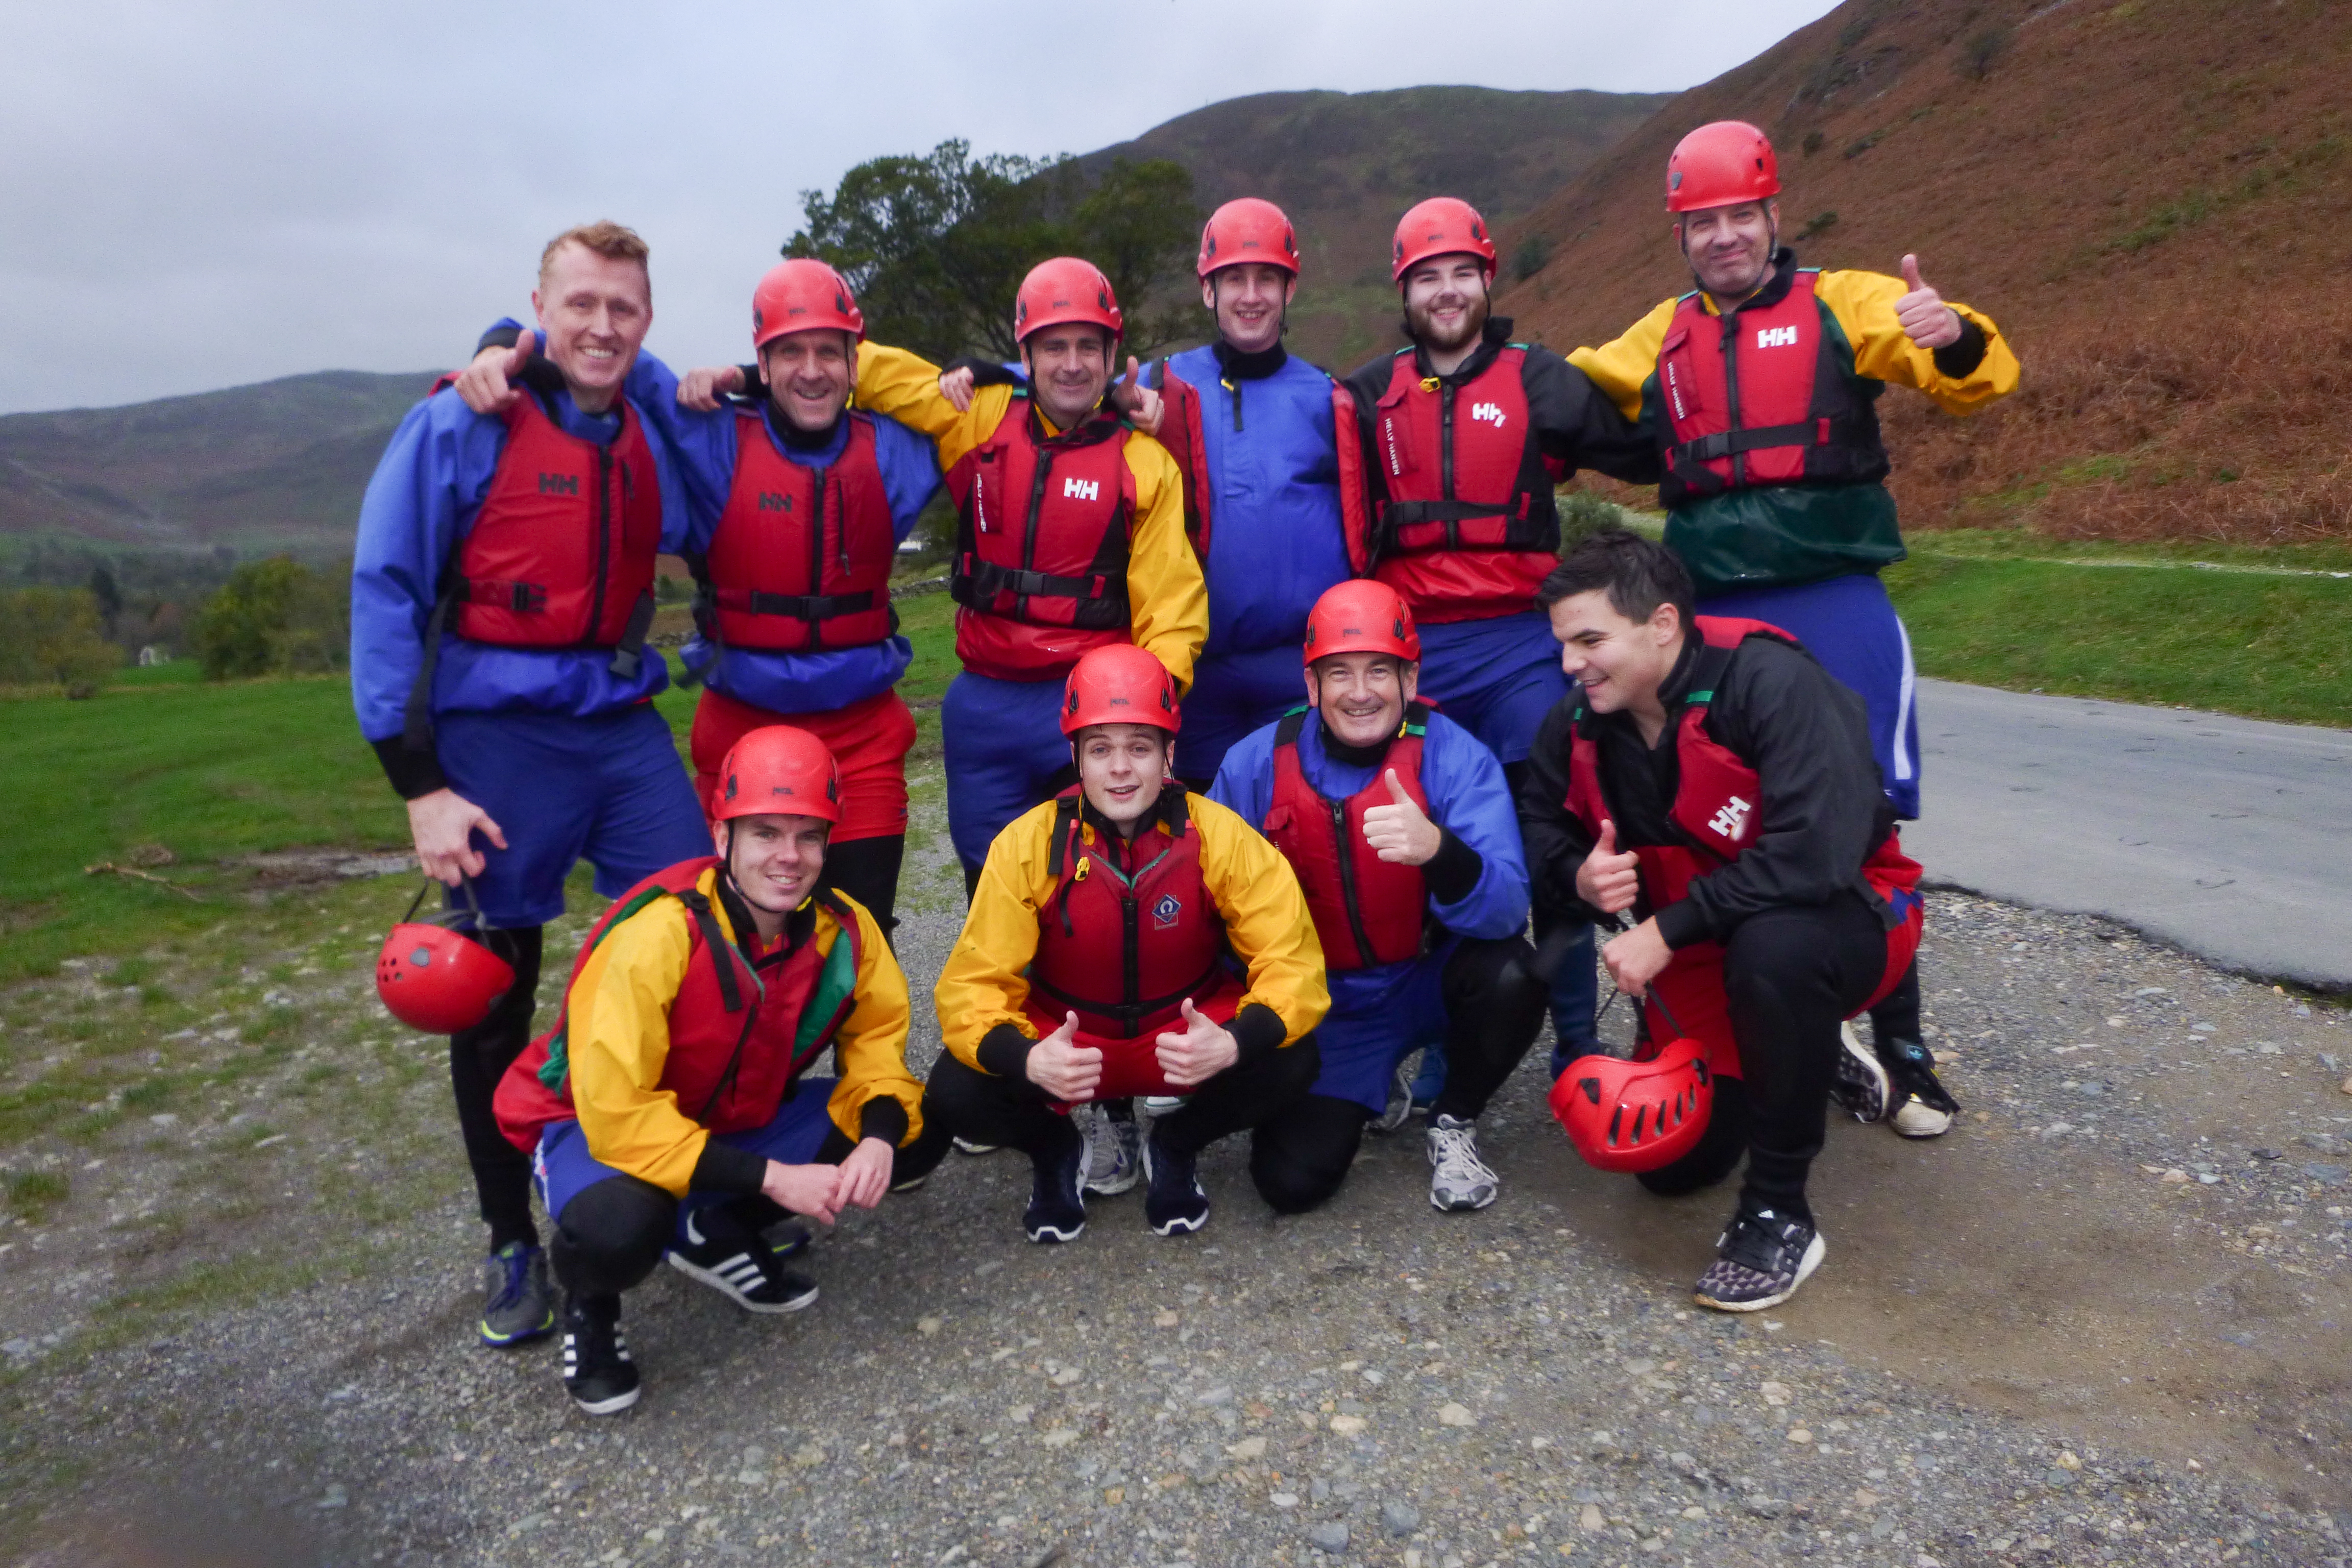 Hydram management team ready to gorge scramble